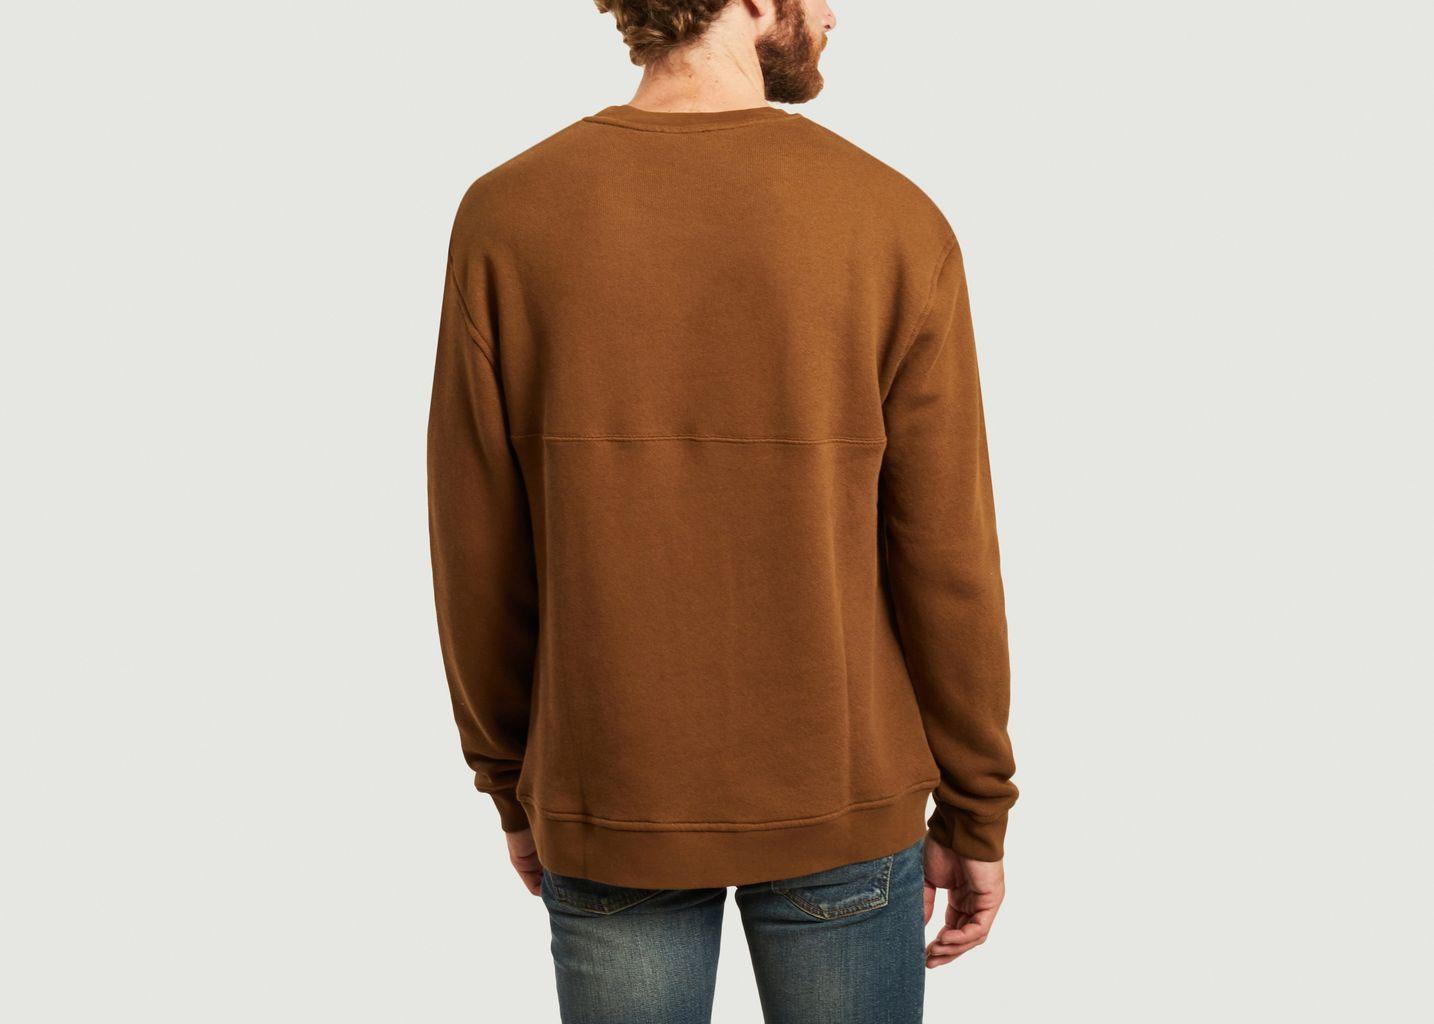 Sweatshirt oversize - Closed